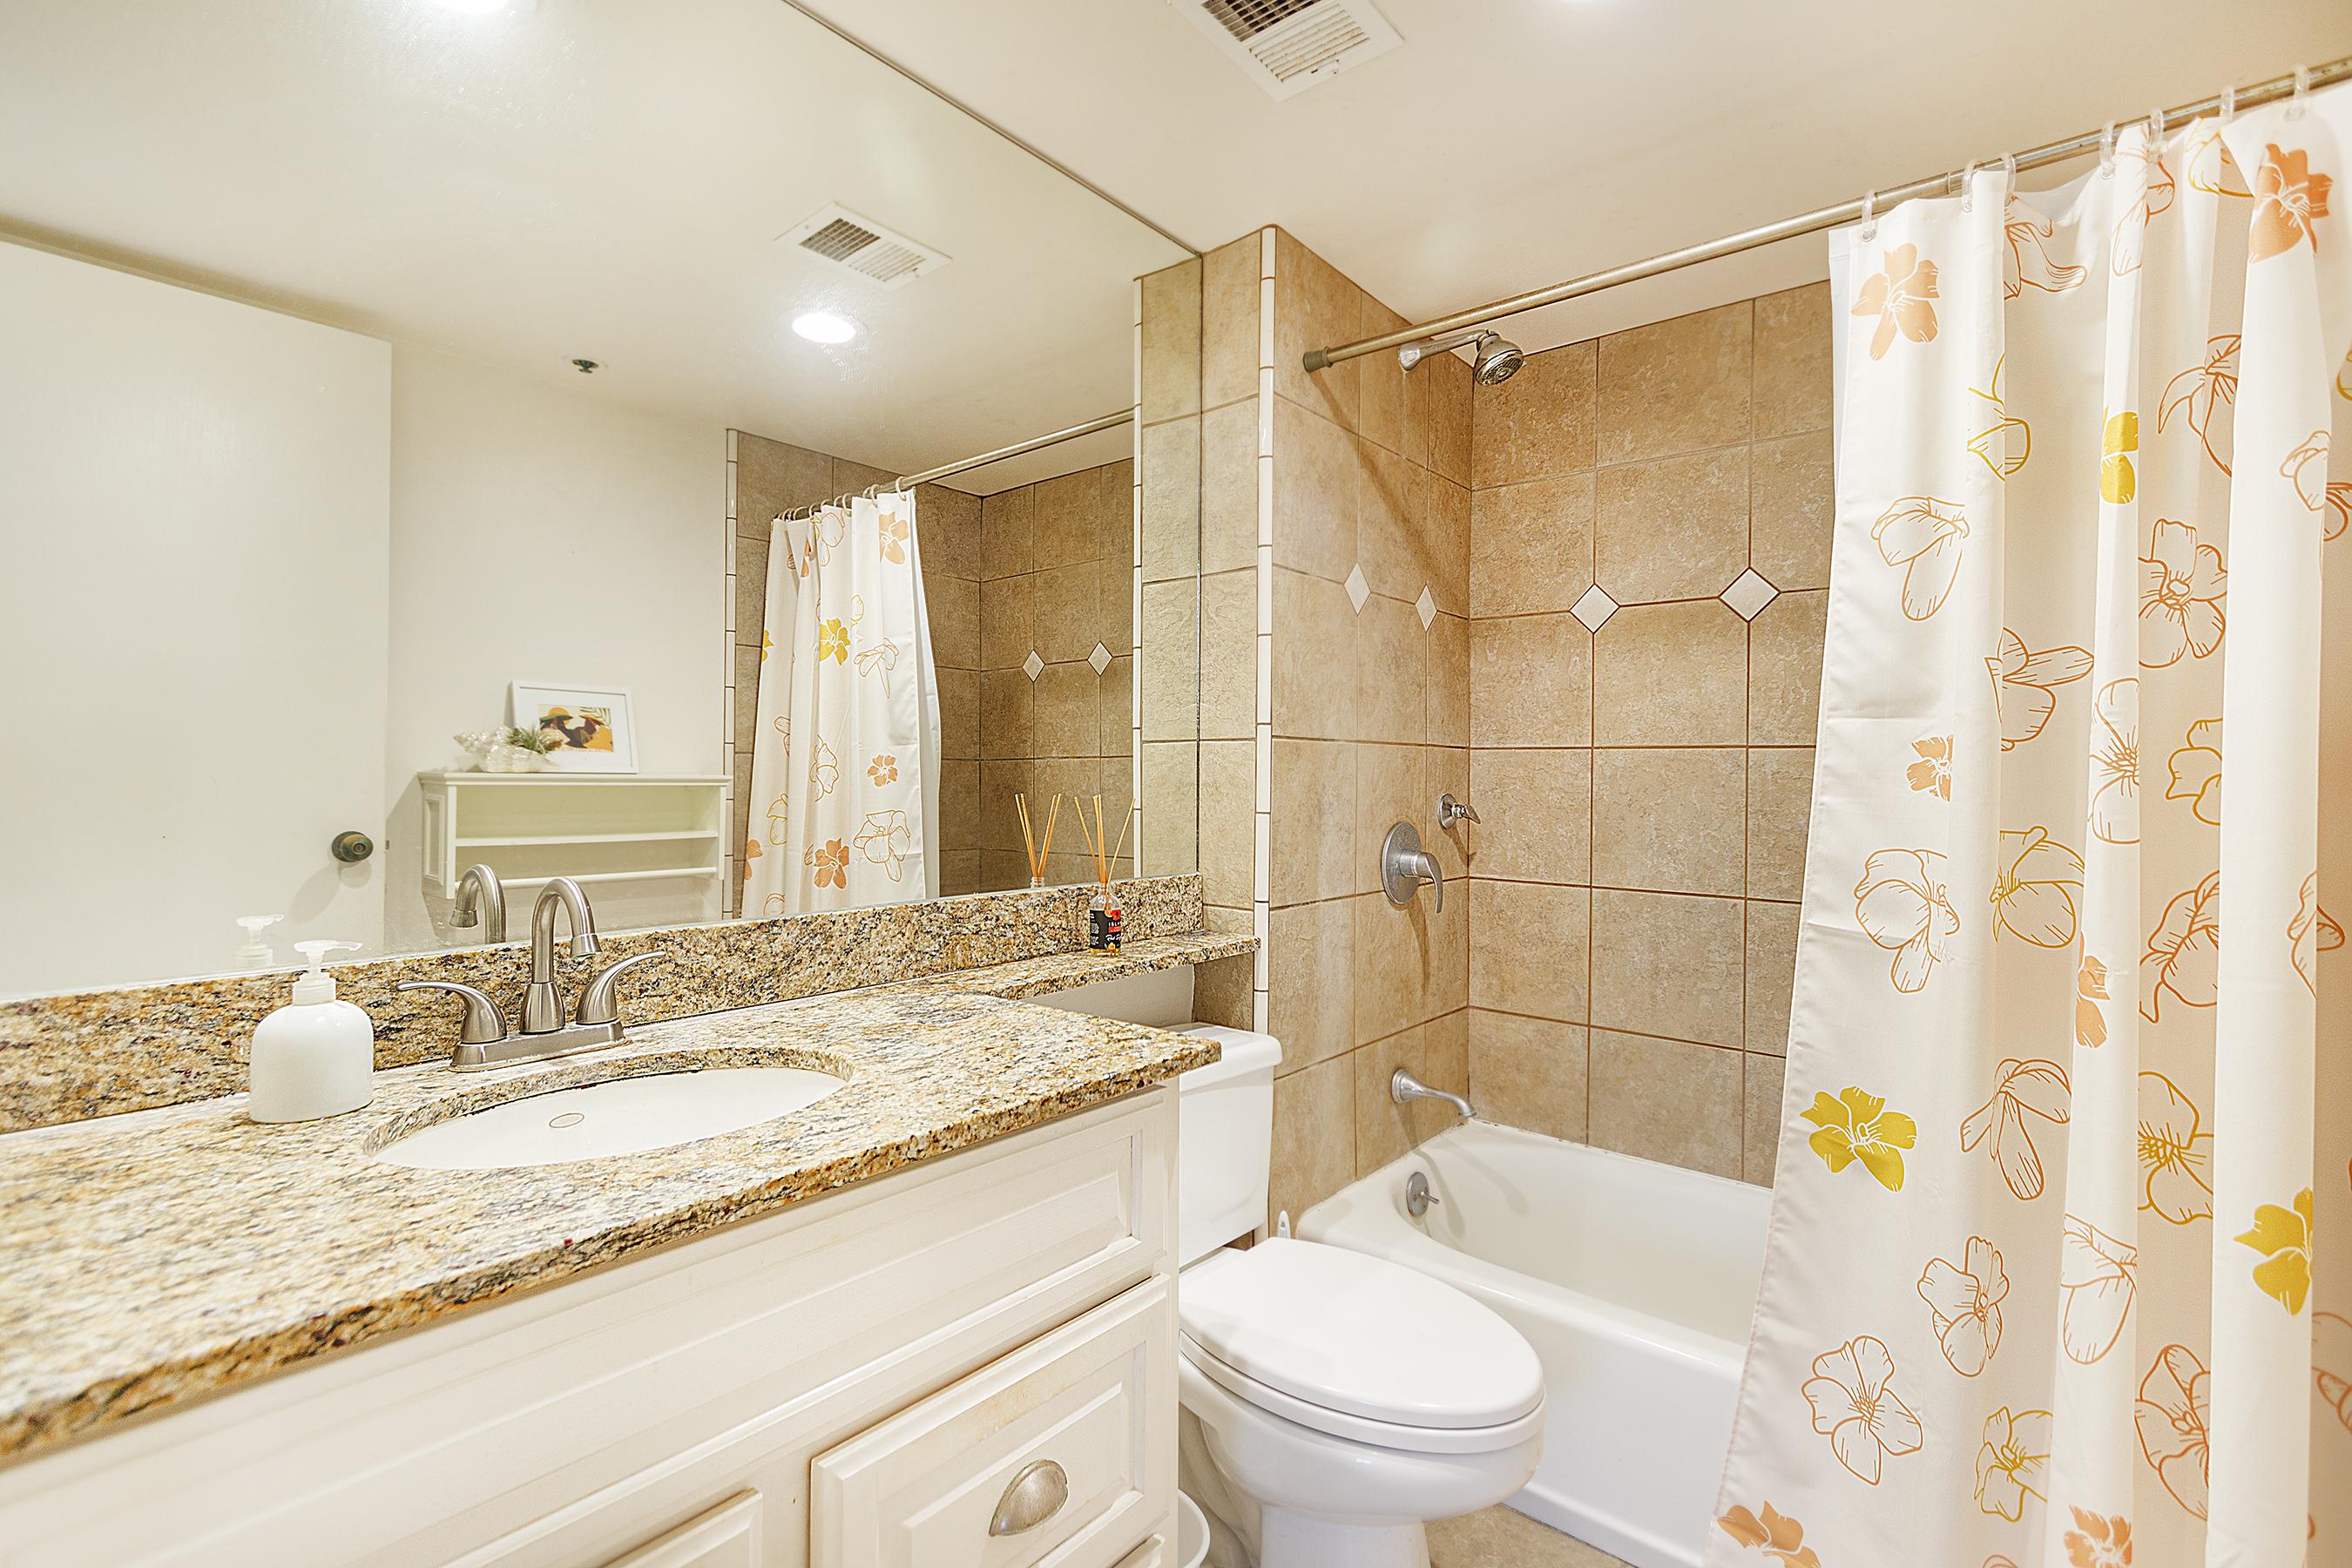 Bathroom at 2101 Nuuanu Ave #I/1806 Honolulu, HI 96817